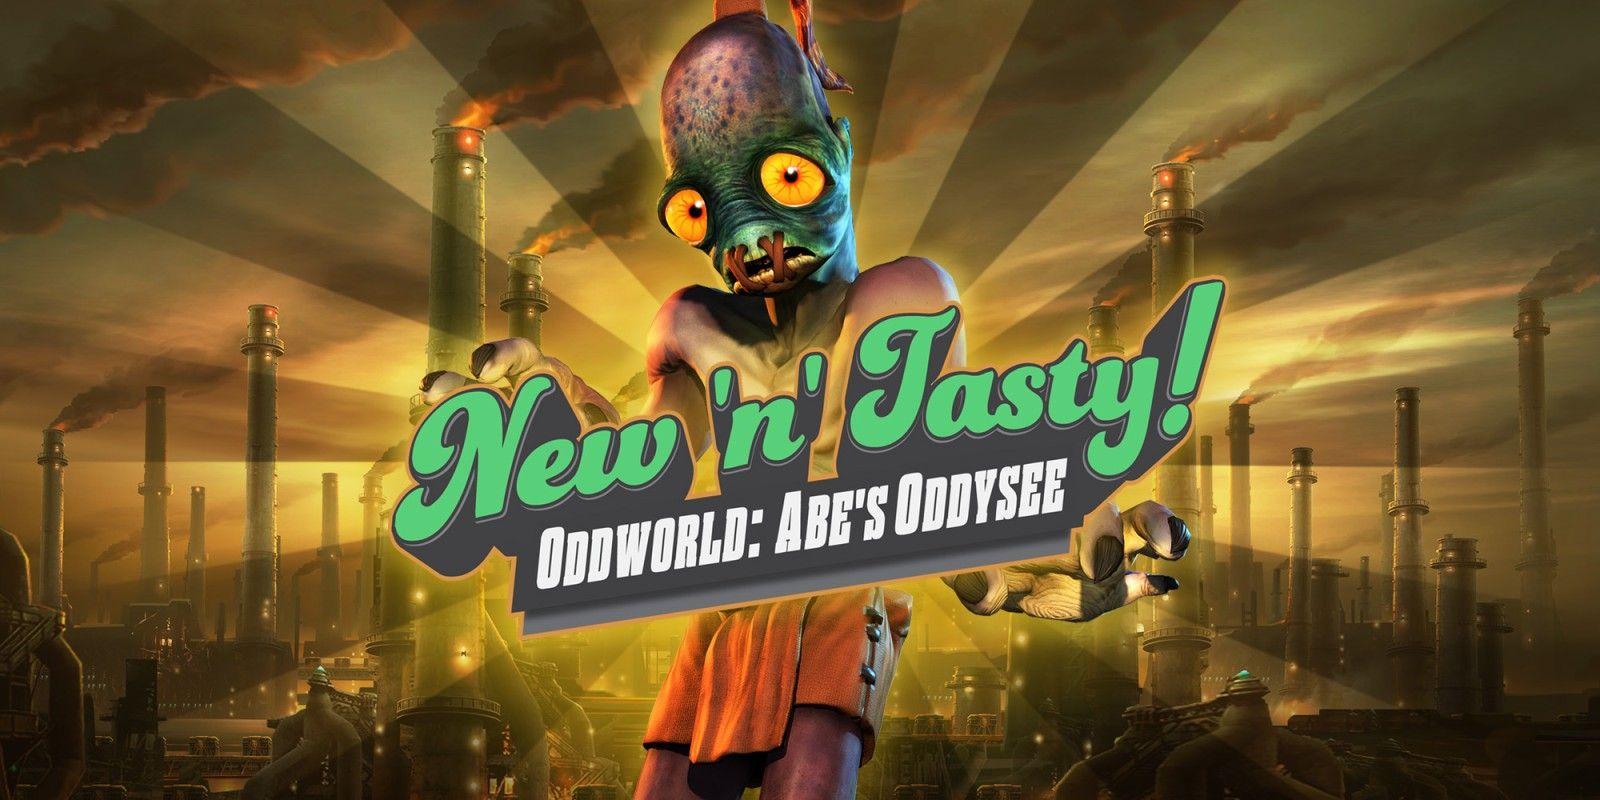 Oddworld: New 'n' Tasty Switch